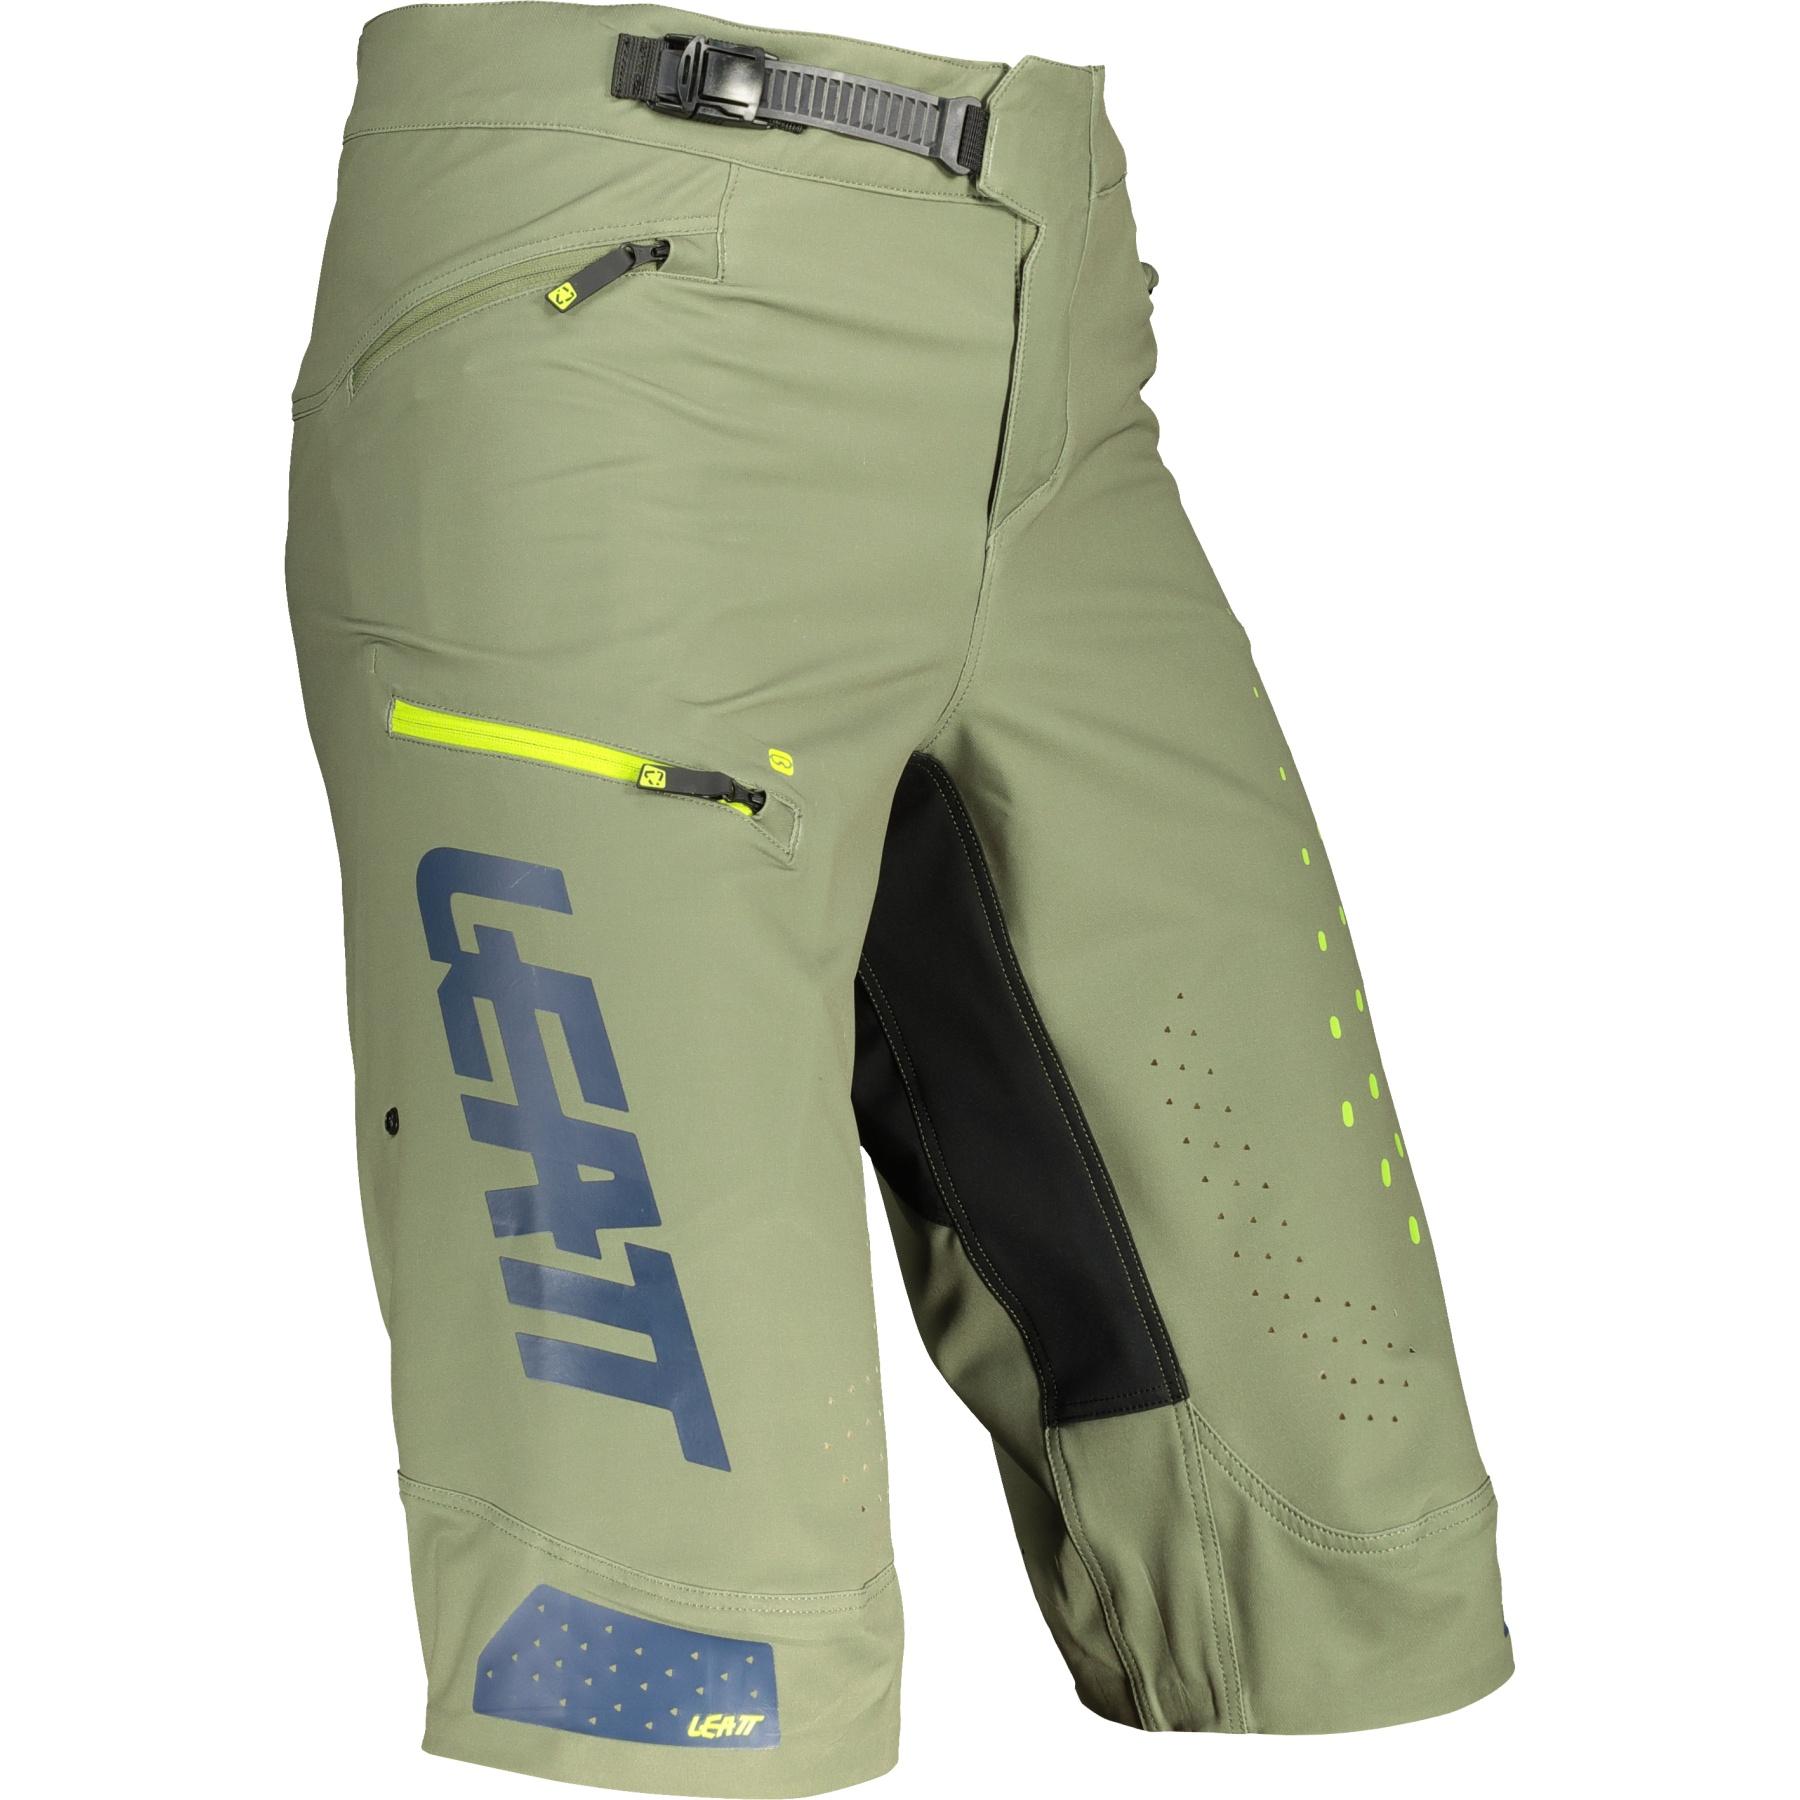 Leatt DBX 4.0 Shorts - cactus